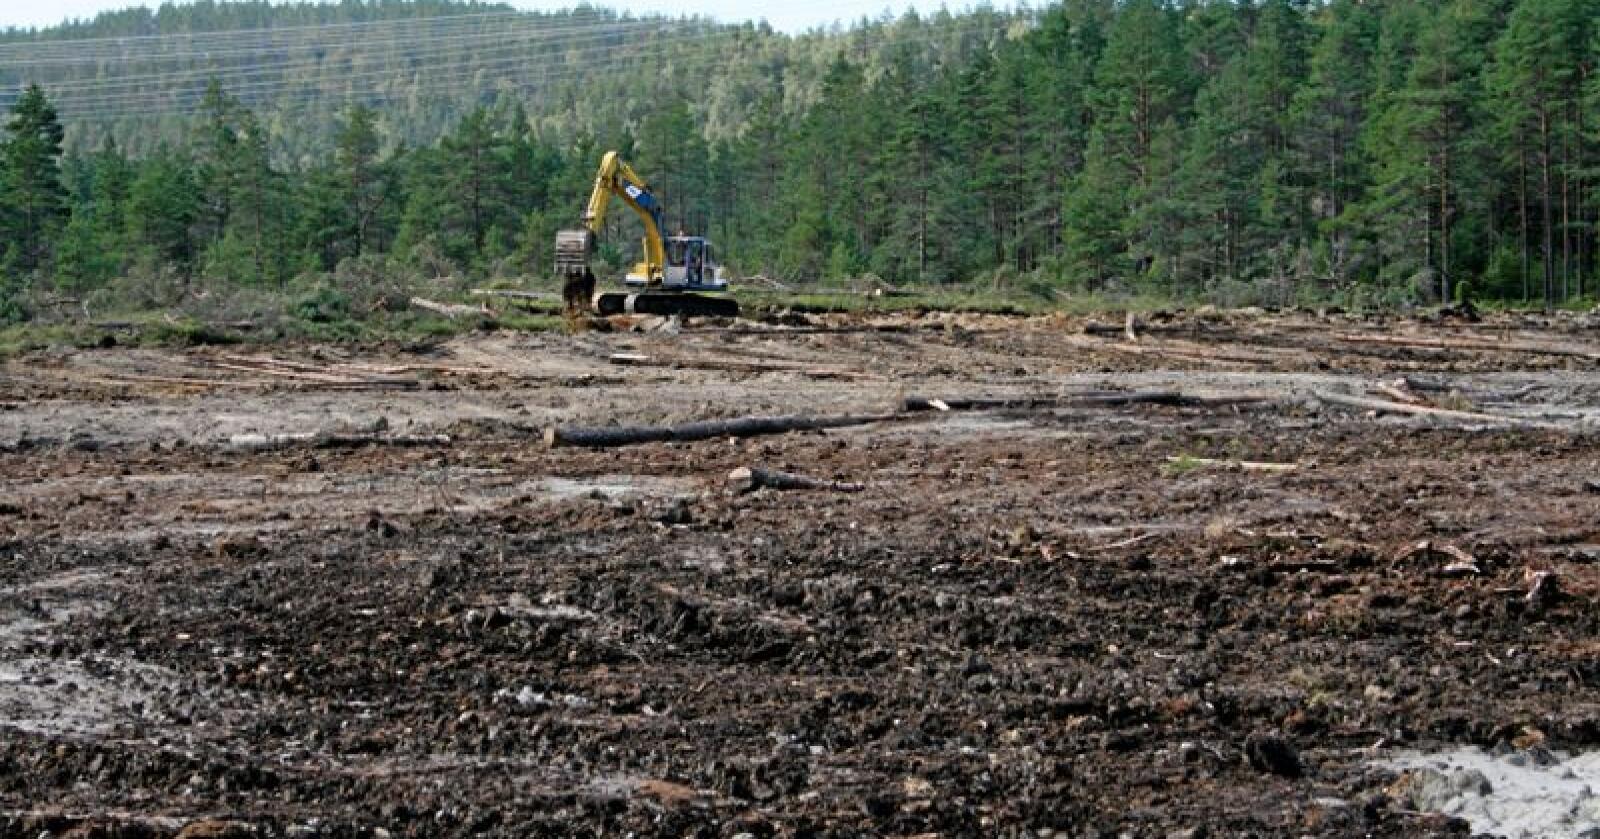 Nydyrking i skogsområde langs fylkesveg 42 inst i Flekkefjord i Vest-Agder.   jordbruk, landbruk, nydyrking, nydyrka, nydyrket, skog, myr, Kobelco gravemaskin, grev, jord, mold, gravearbeid, diesel, dieselbruk, maskin, maskinbruk, nybrottsarbeid,